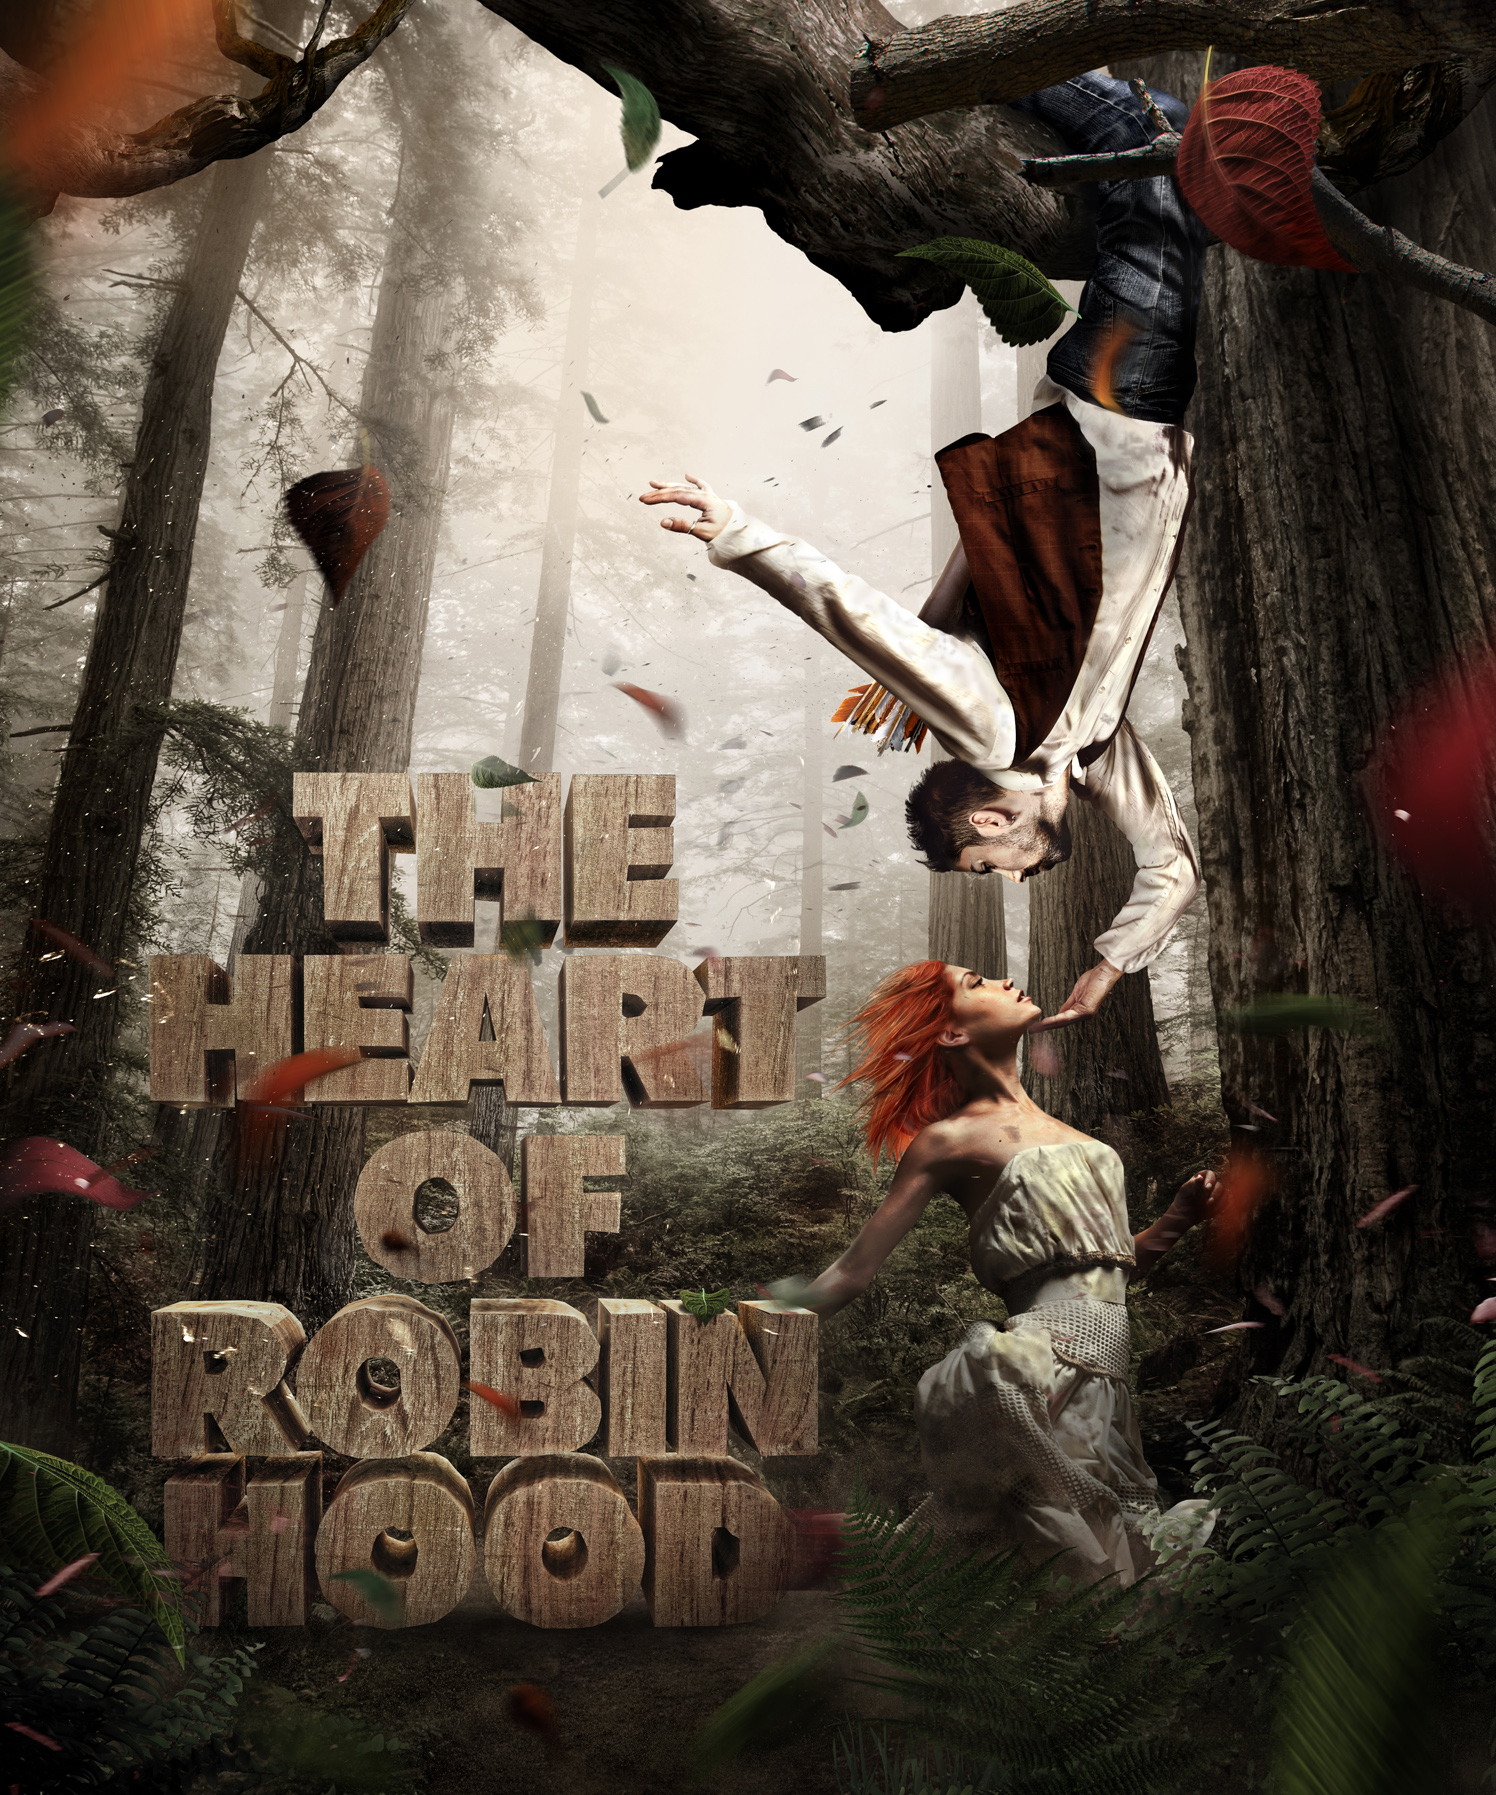 RSC - The Heart of Robin Hood